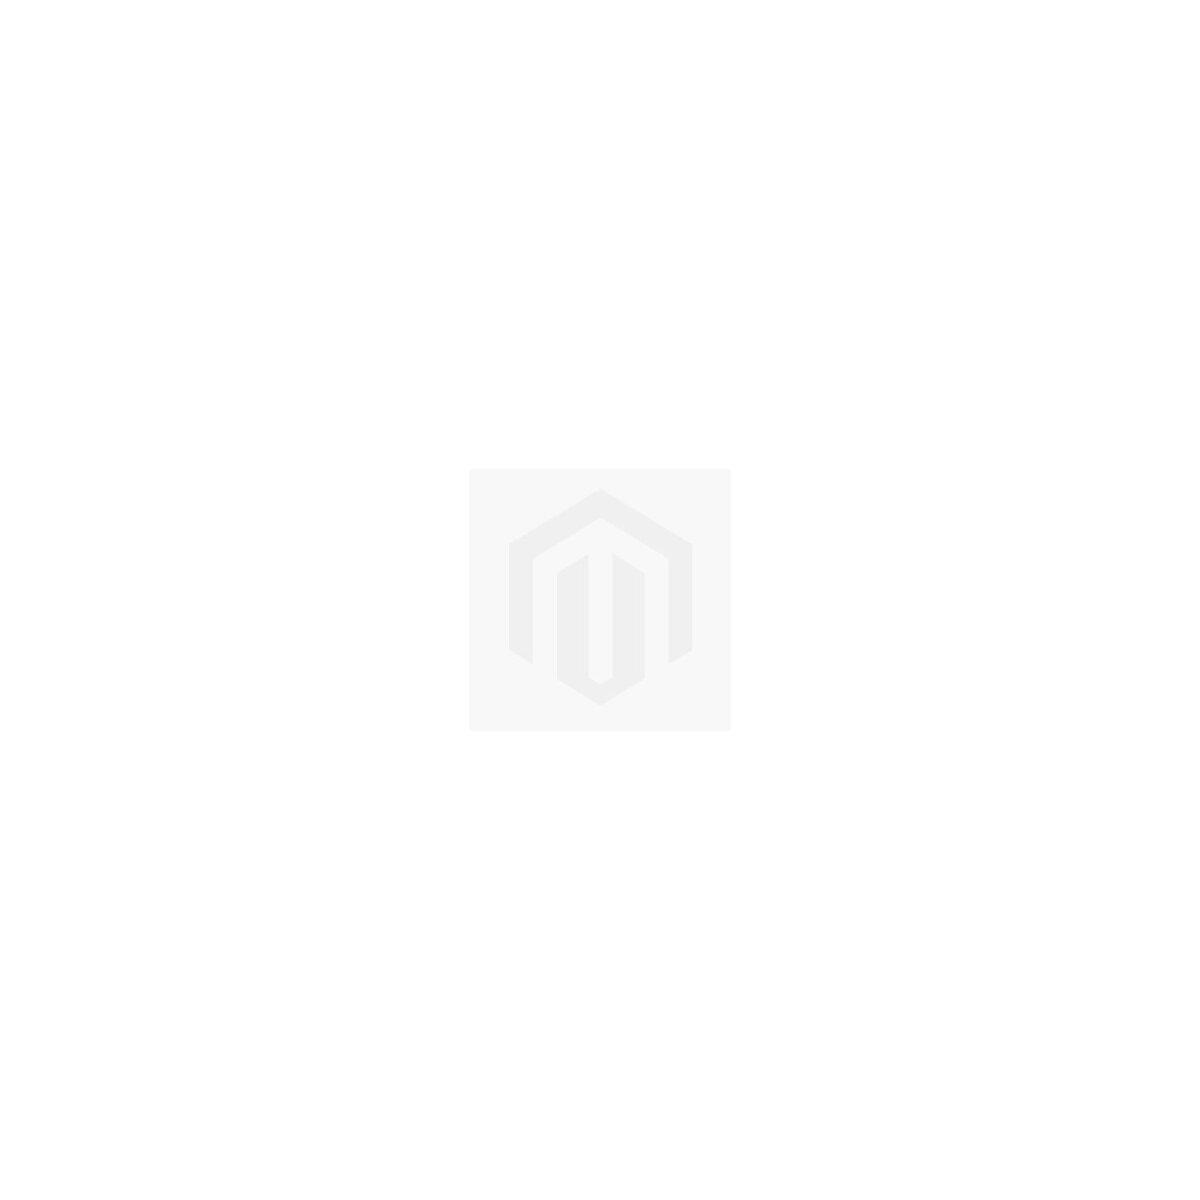 led aufbauprofil surf12 flat aluminium pulverbeschichtet wei ral 901 5 95. Black Bedroom Furniture Sets. Home Design Ideas